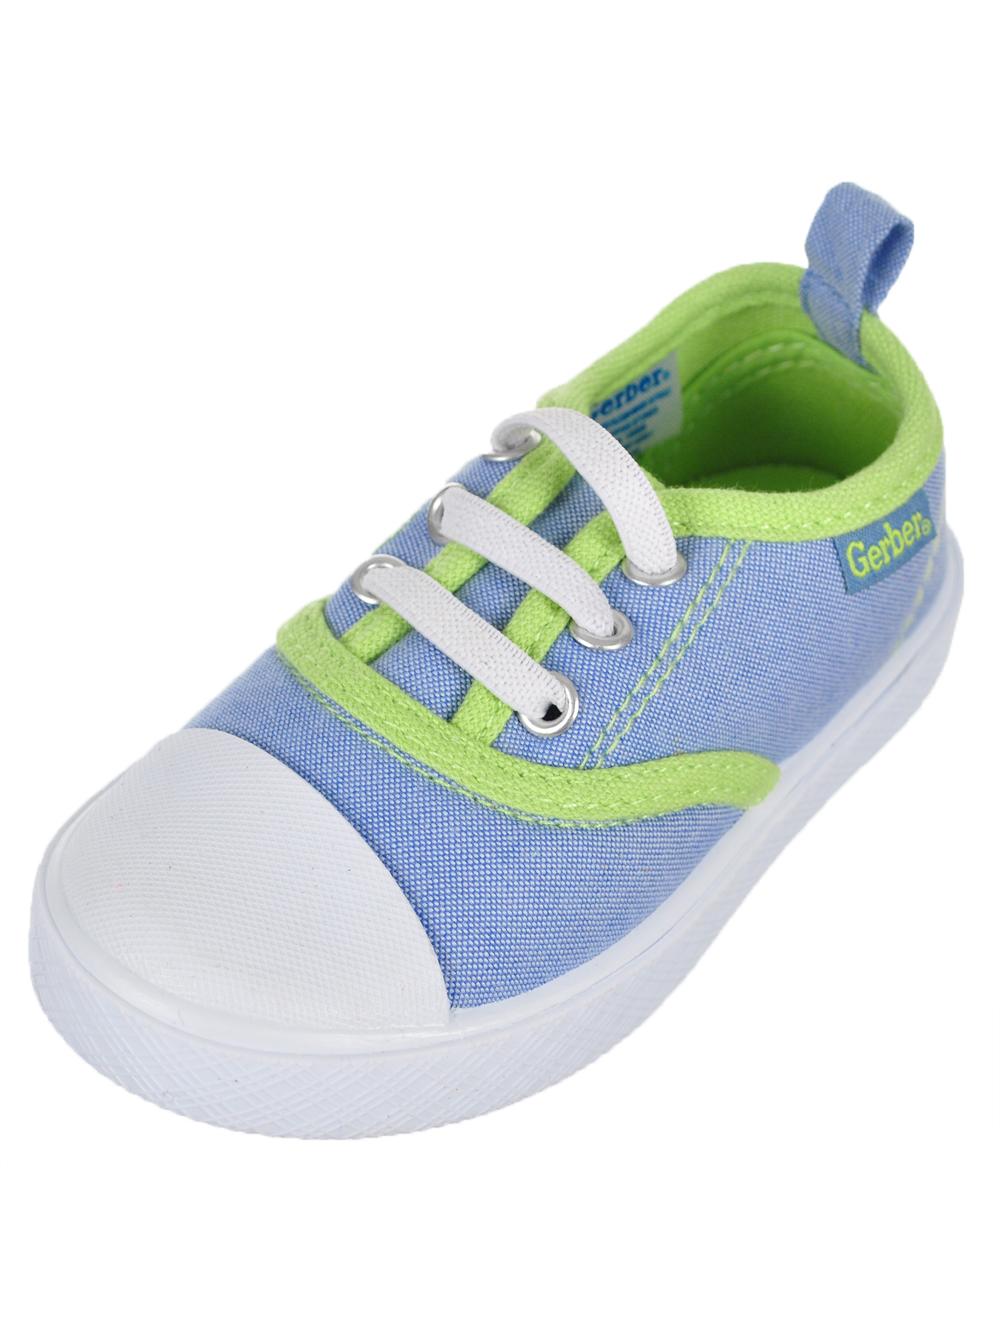 Boys' First Walker Low-Top Sneakers (Sizes 3 - 6)